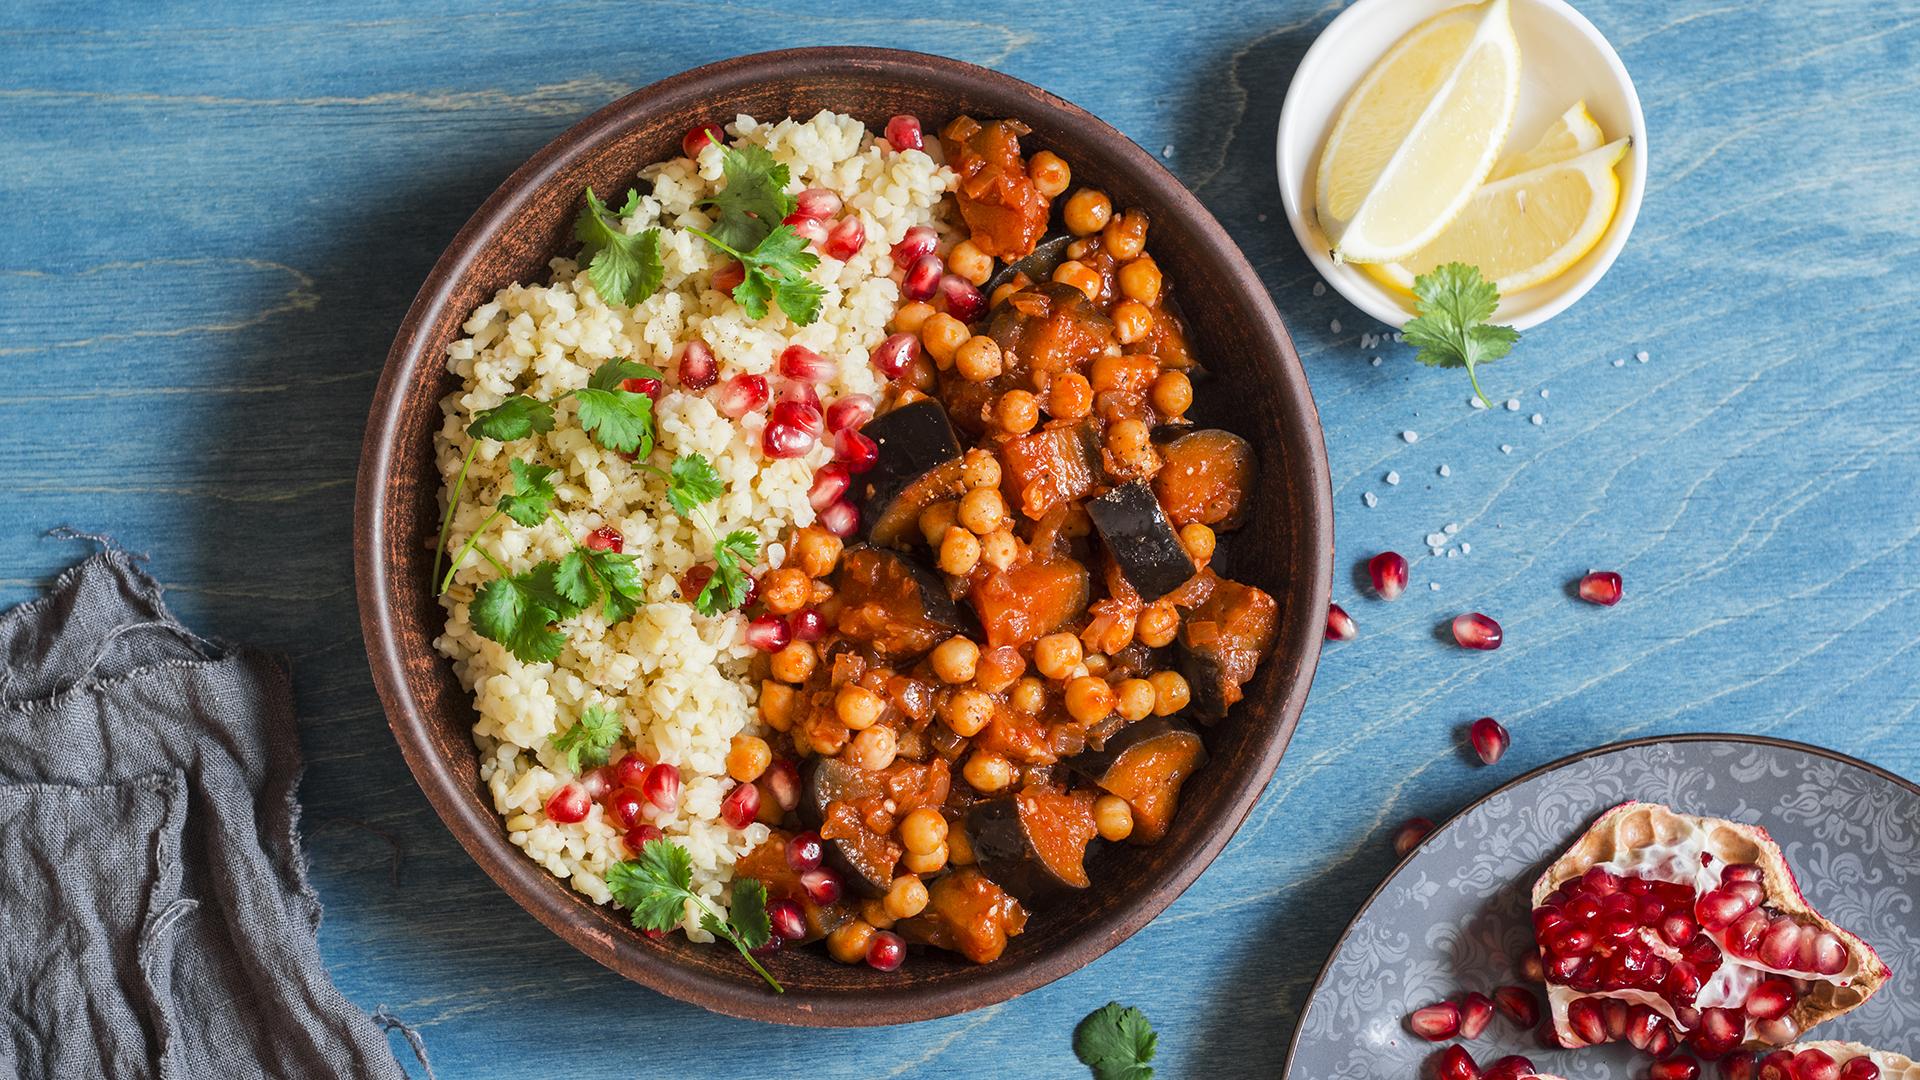 11 Healthier Alternatives to Your Favorite Winter Comfort Food